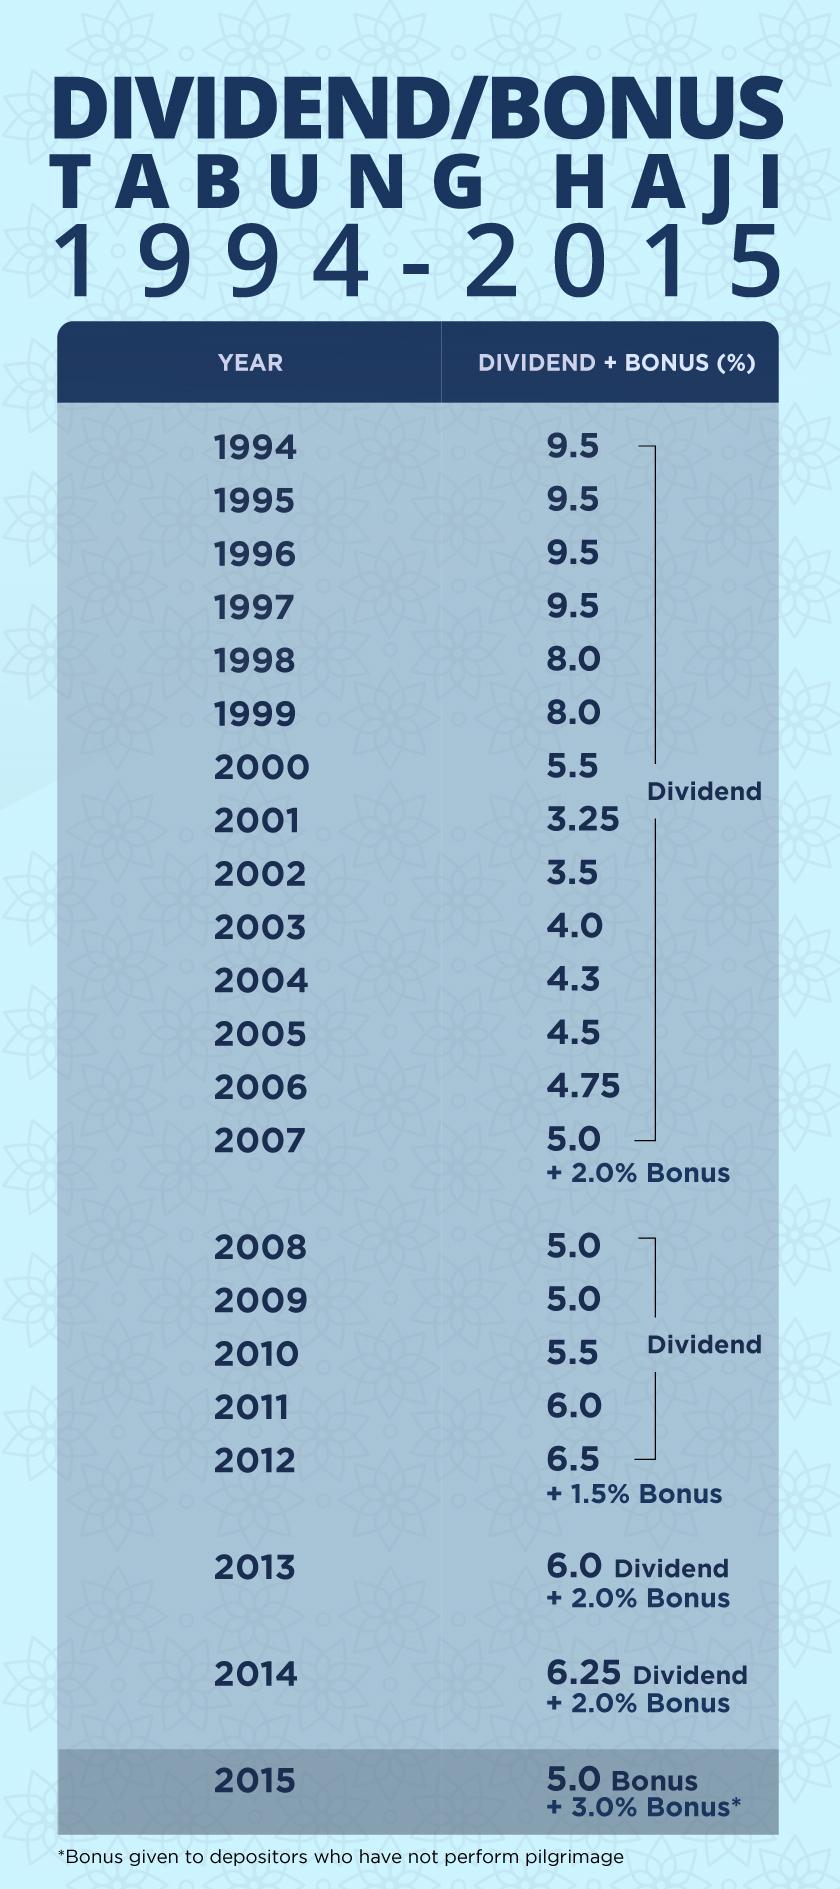 Infographic Tabung Haji Dividend And Bonus Distribution 1994 2015 Astro Awani